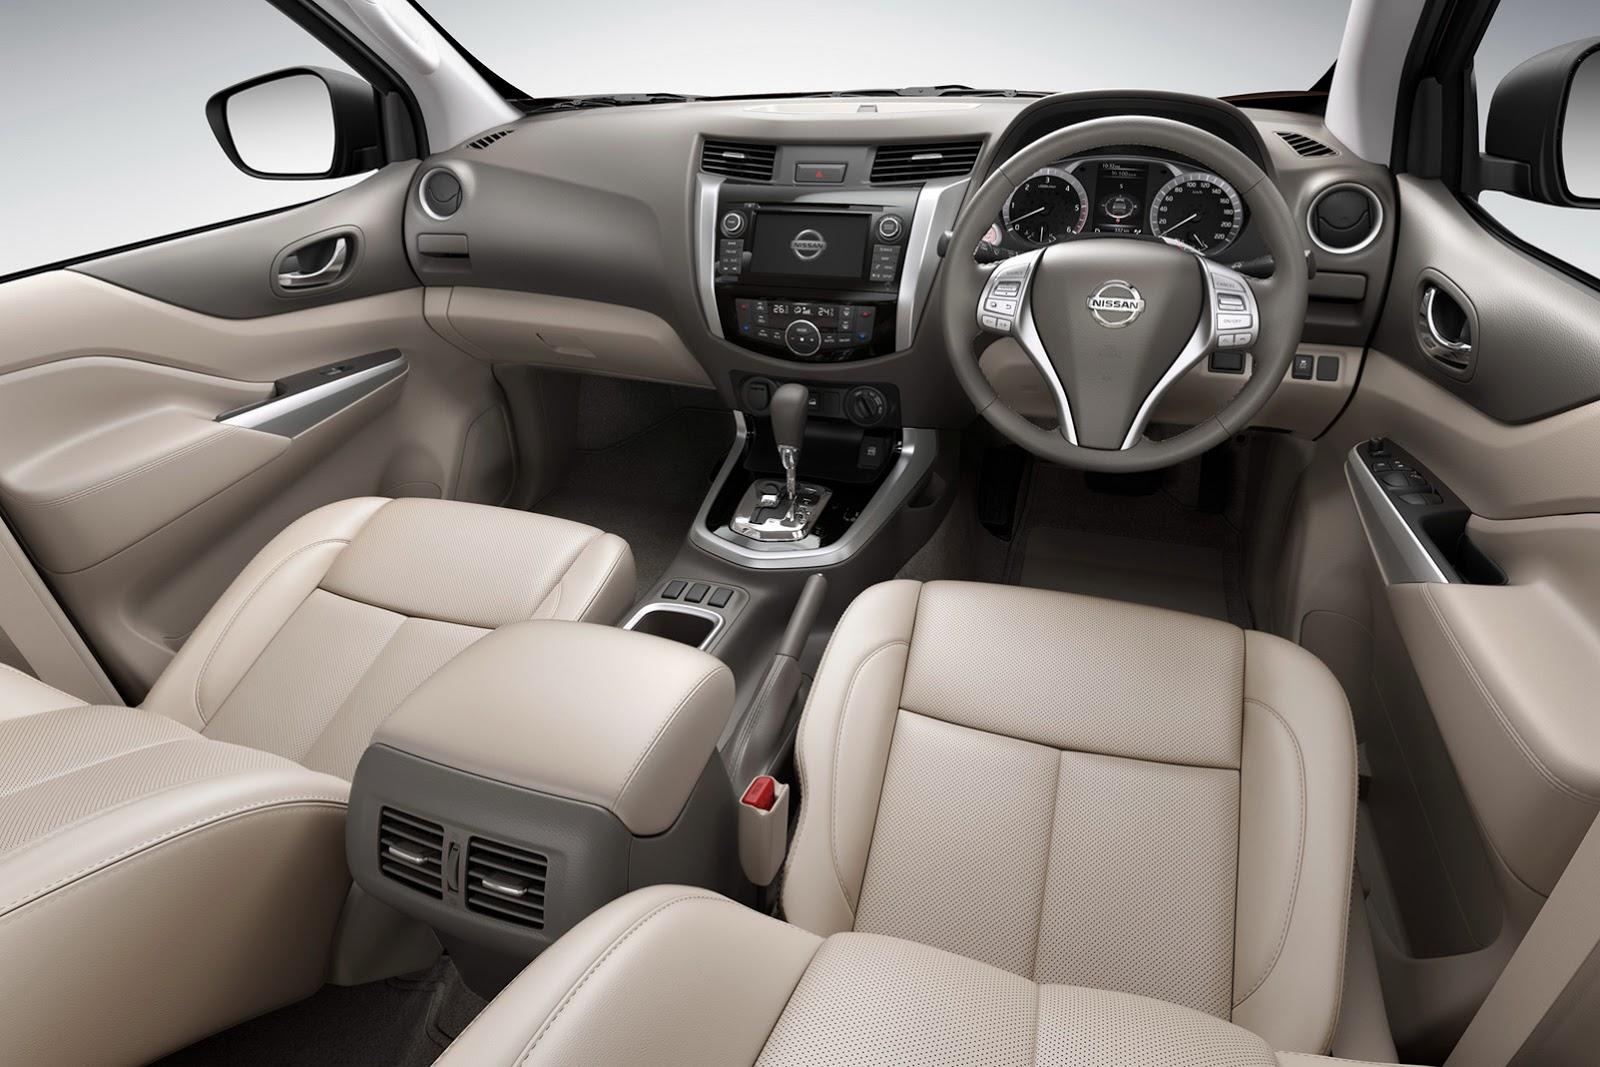 Nissan NP300 Navara Pickup Officially Revealed, w/ Video - Japanese ...